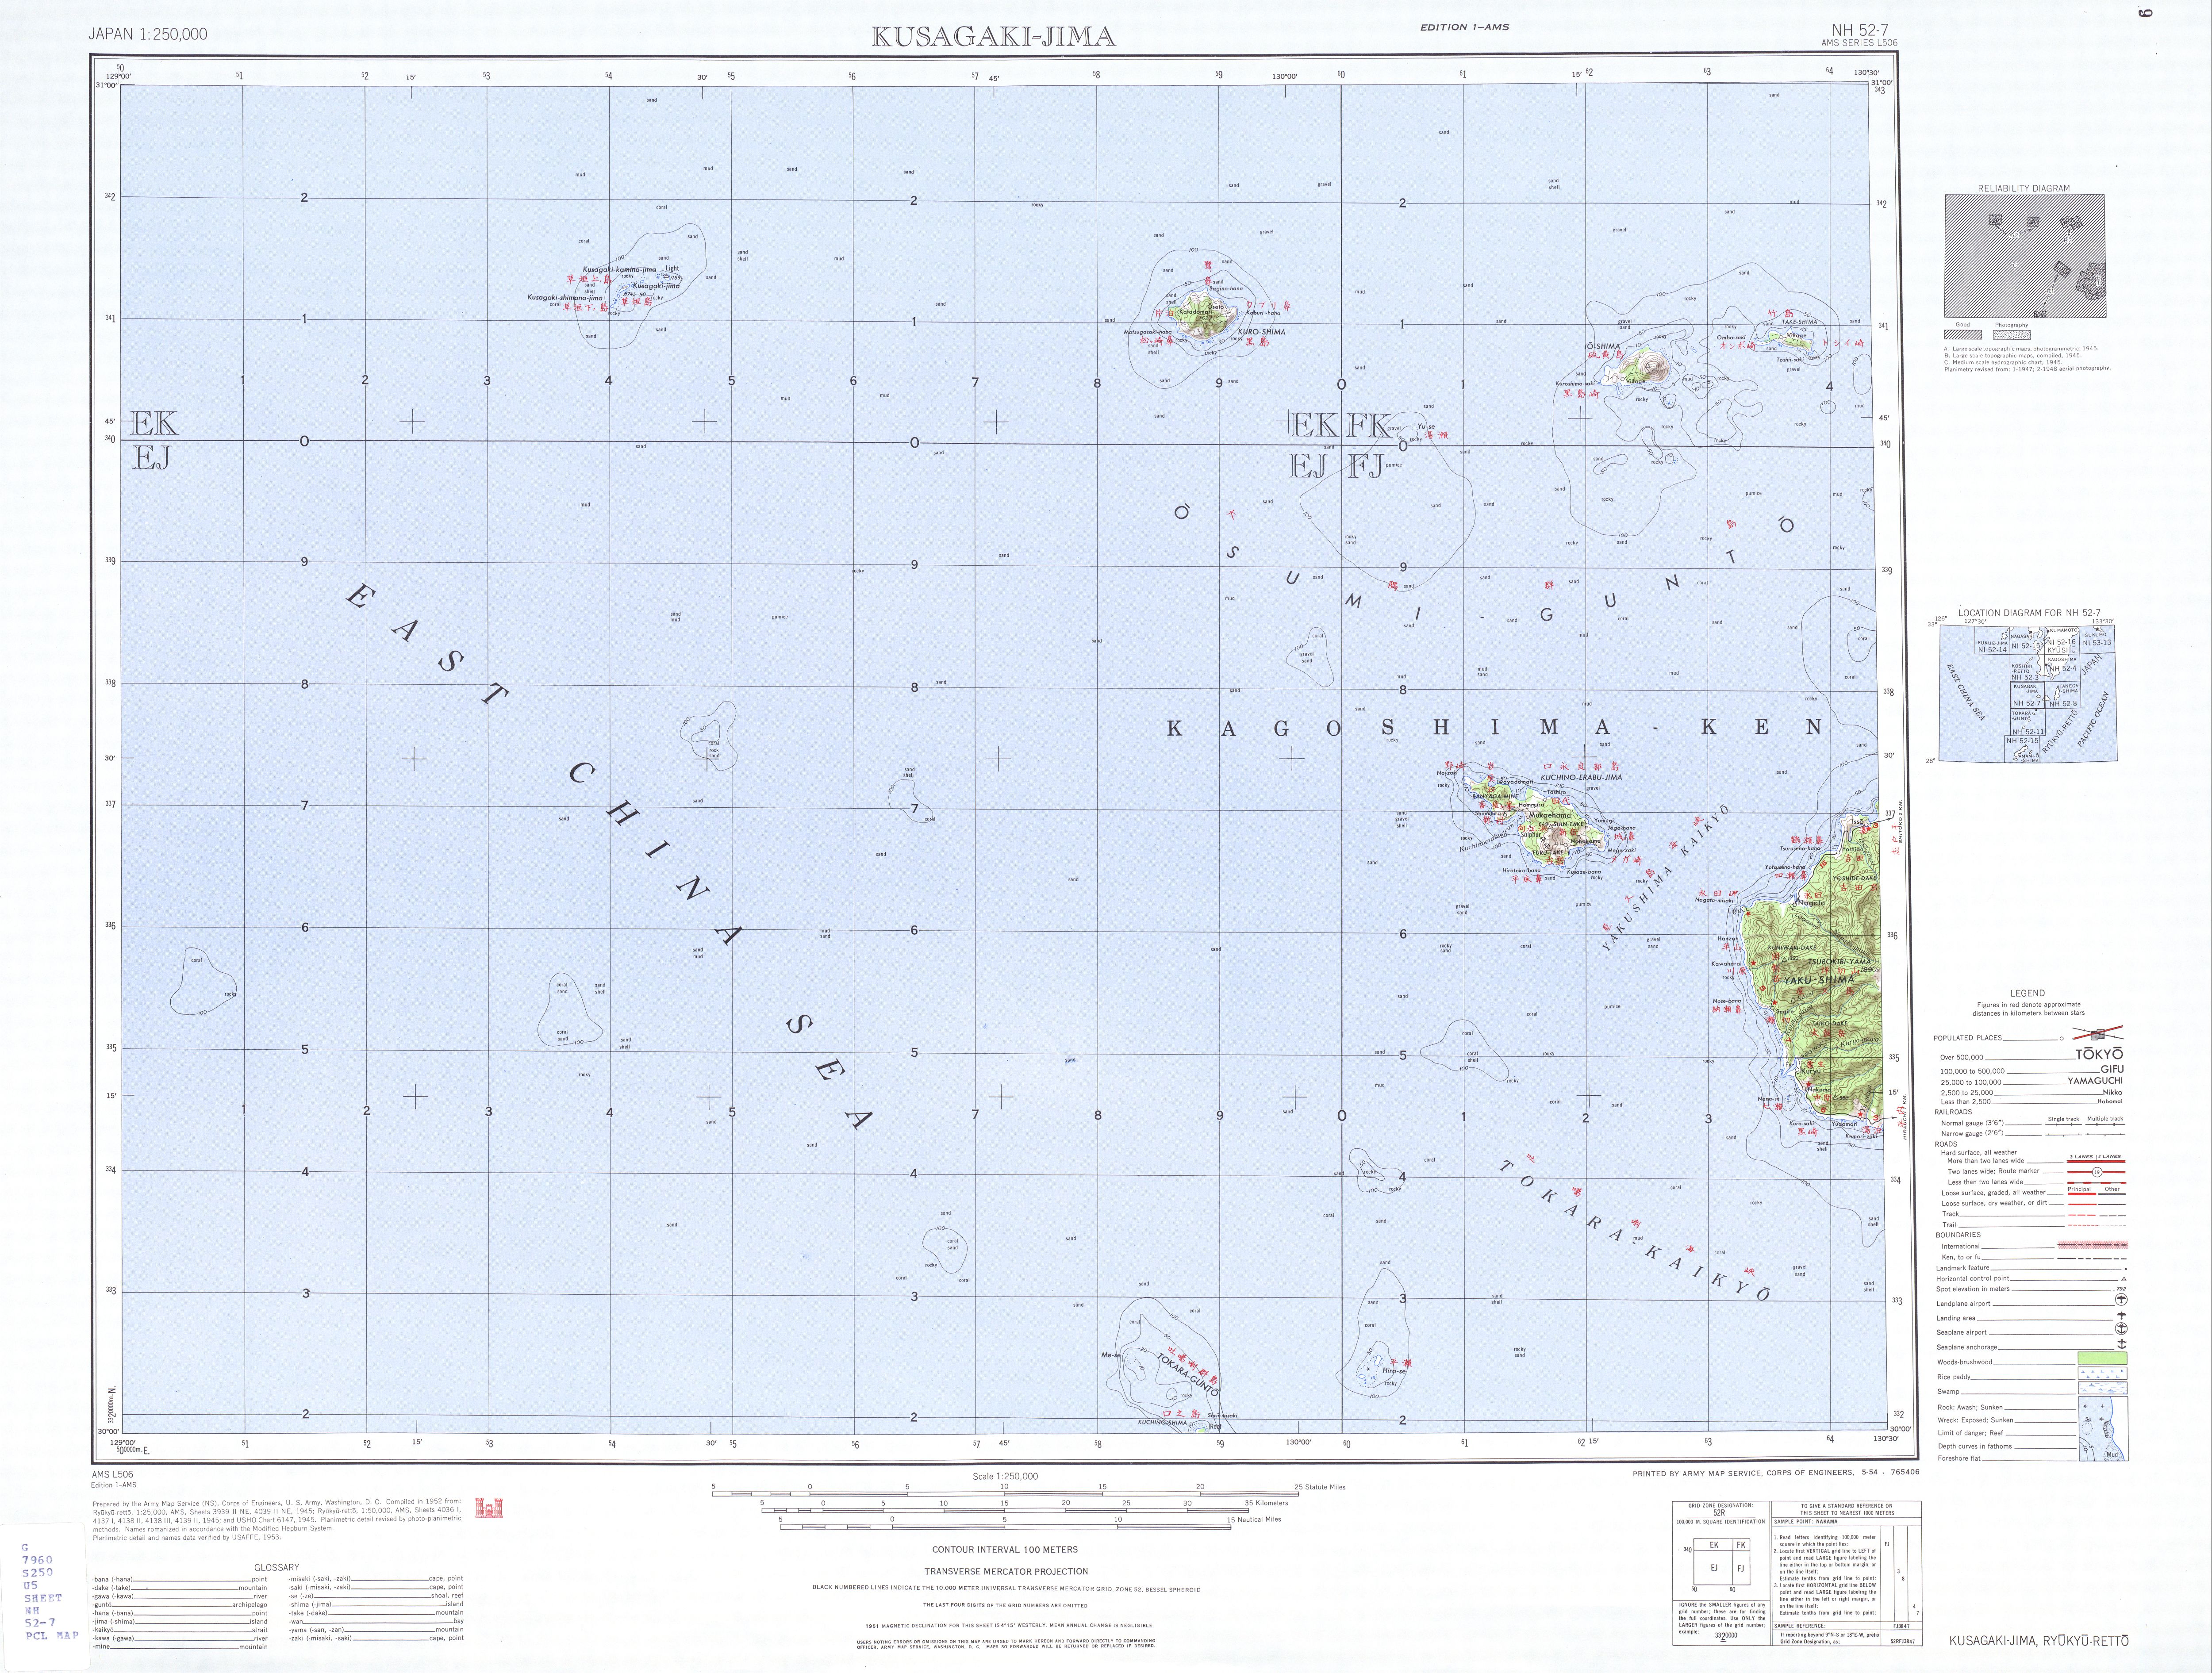 Kusagaki-Jima Topographic Map Sheet, Japan 1954